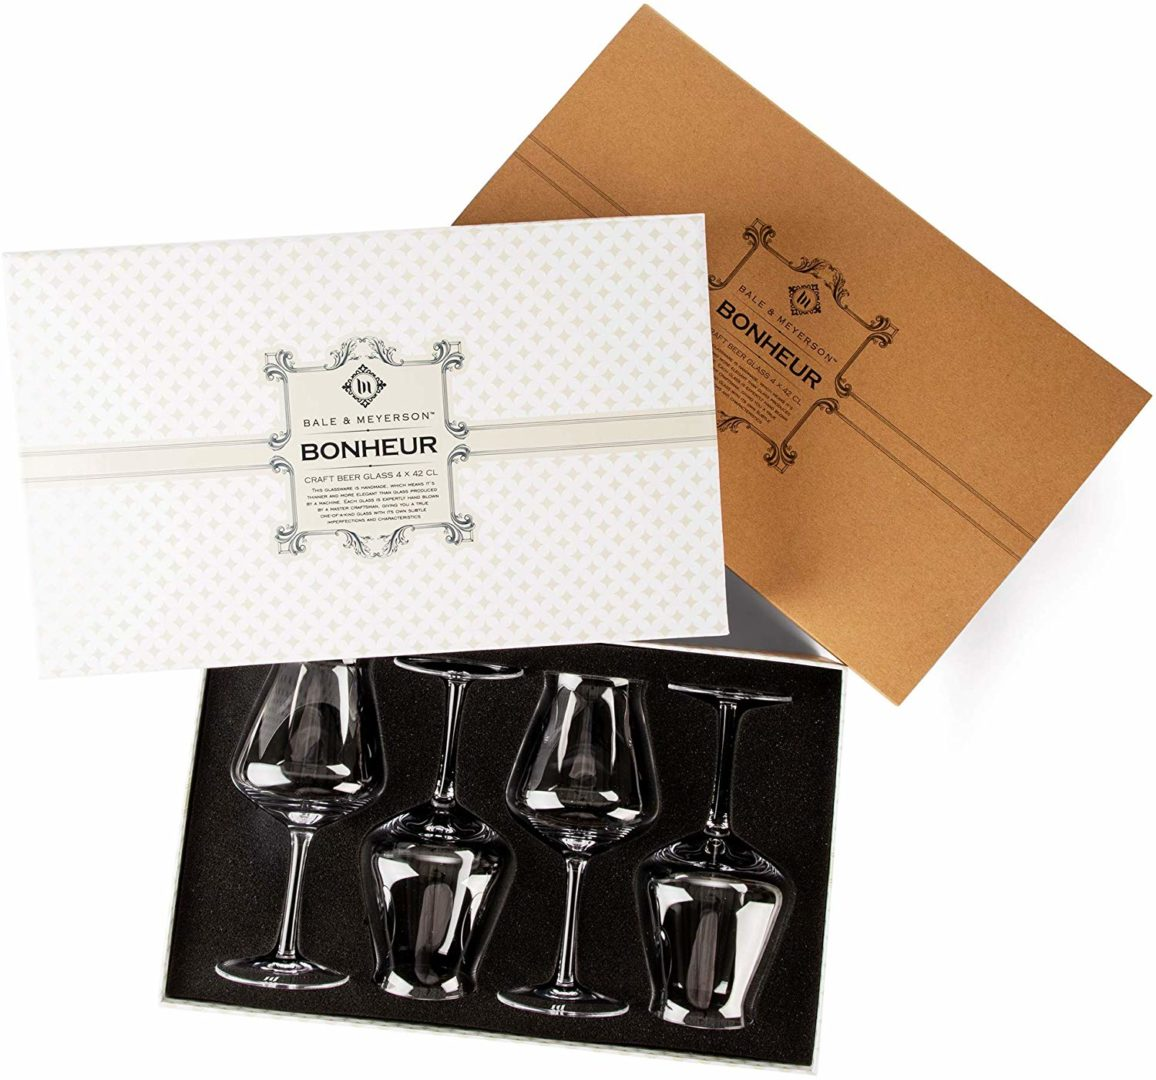 Rastal Teku Craft Beer and Cider Glasses - Gift Box Set